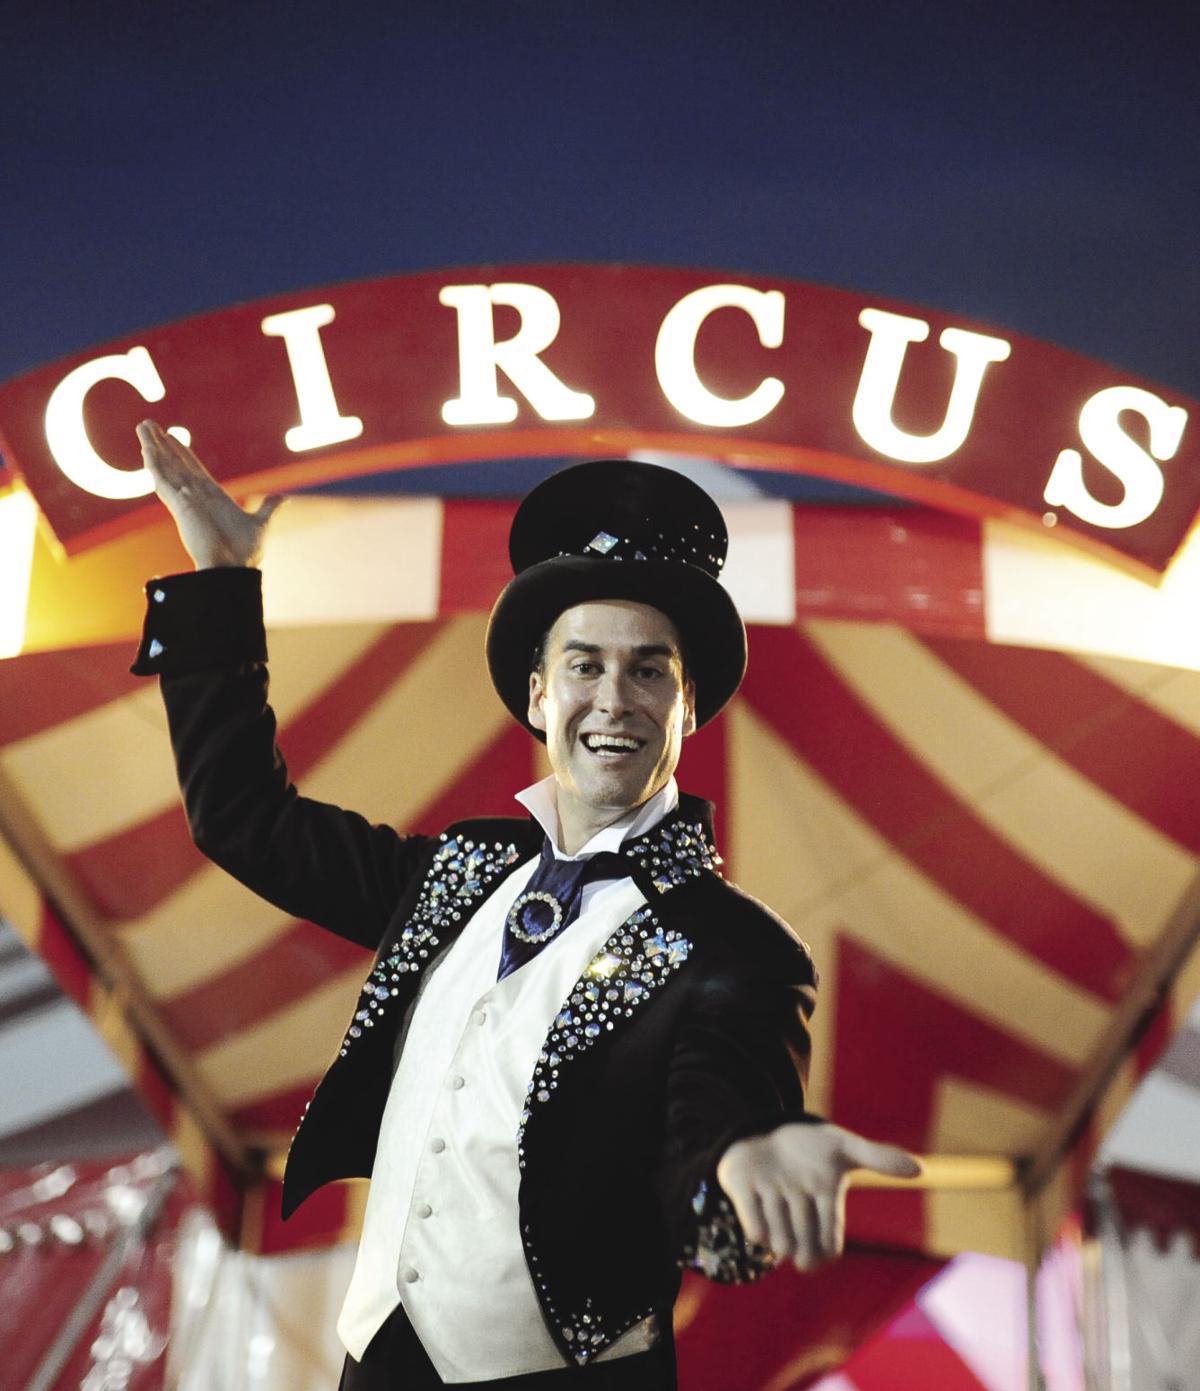 Venardos Circus brings the magic of the big top to viewers at home